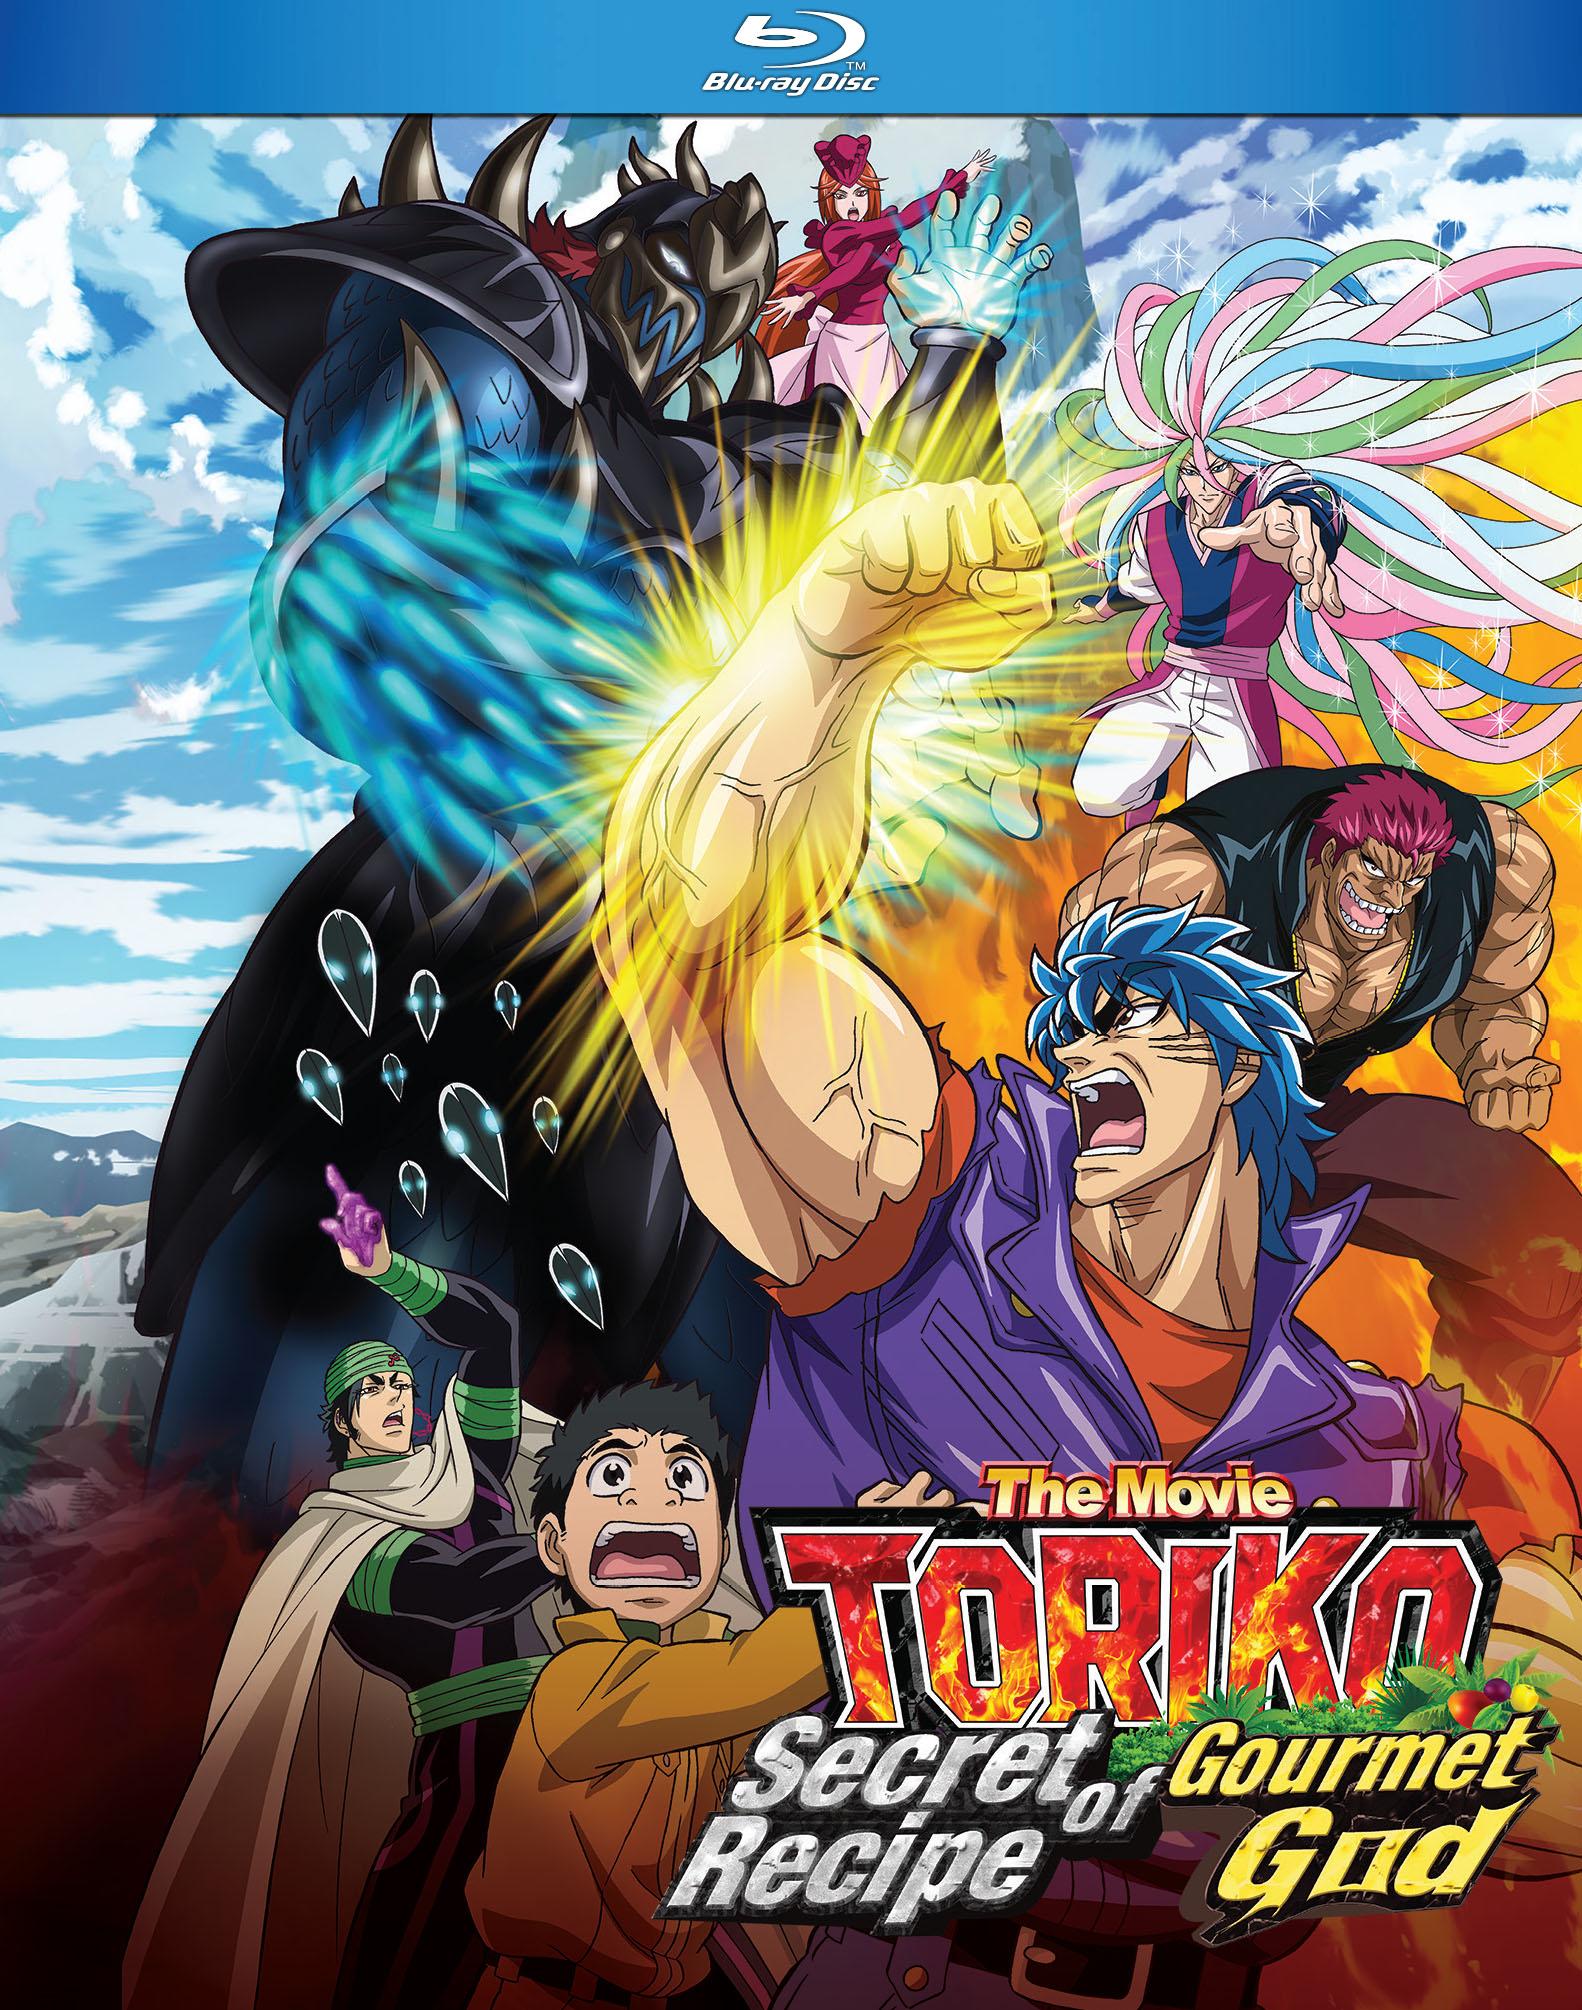 Toriko The Movie Secret Recipe Of Gourmet God Blu-ray 875707164023